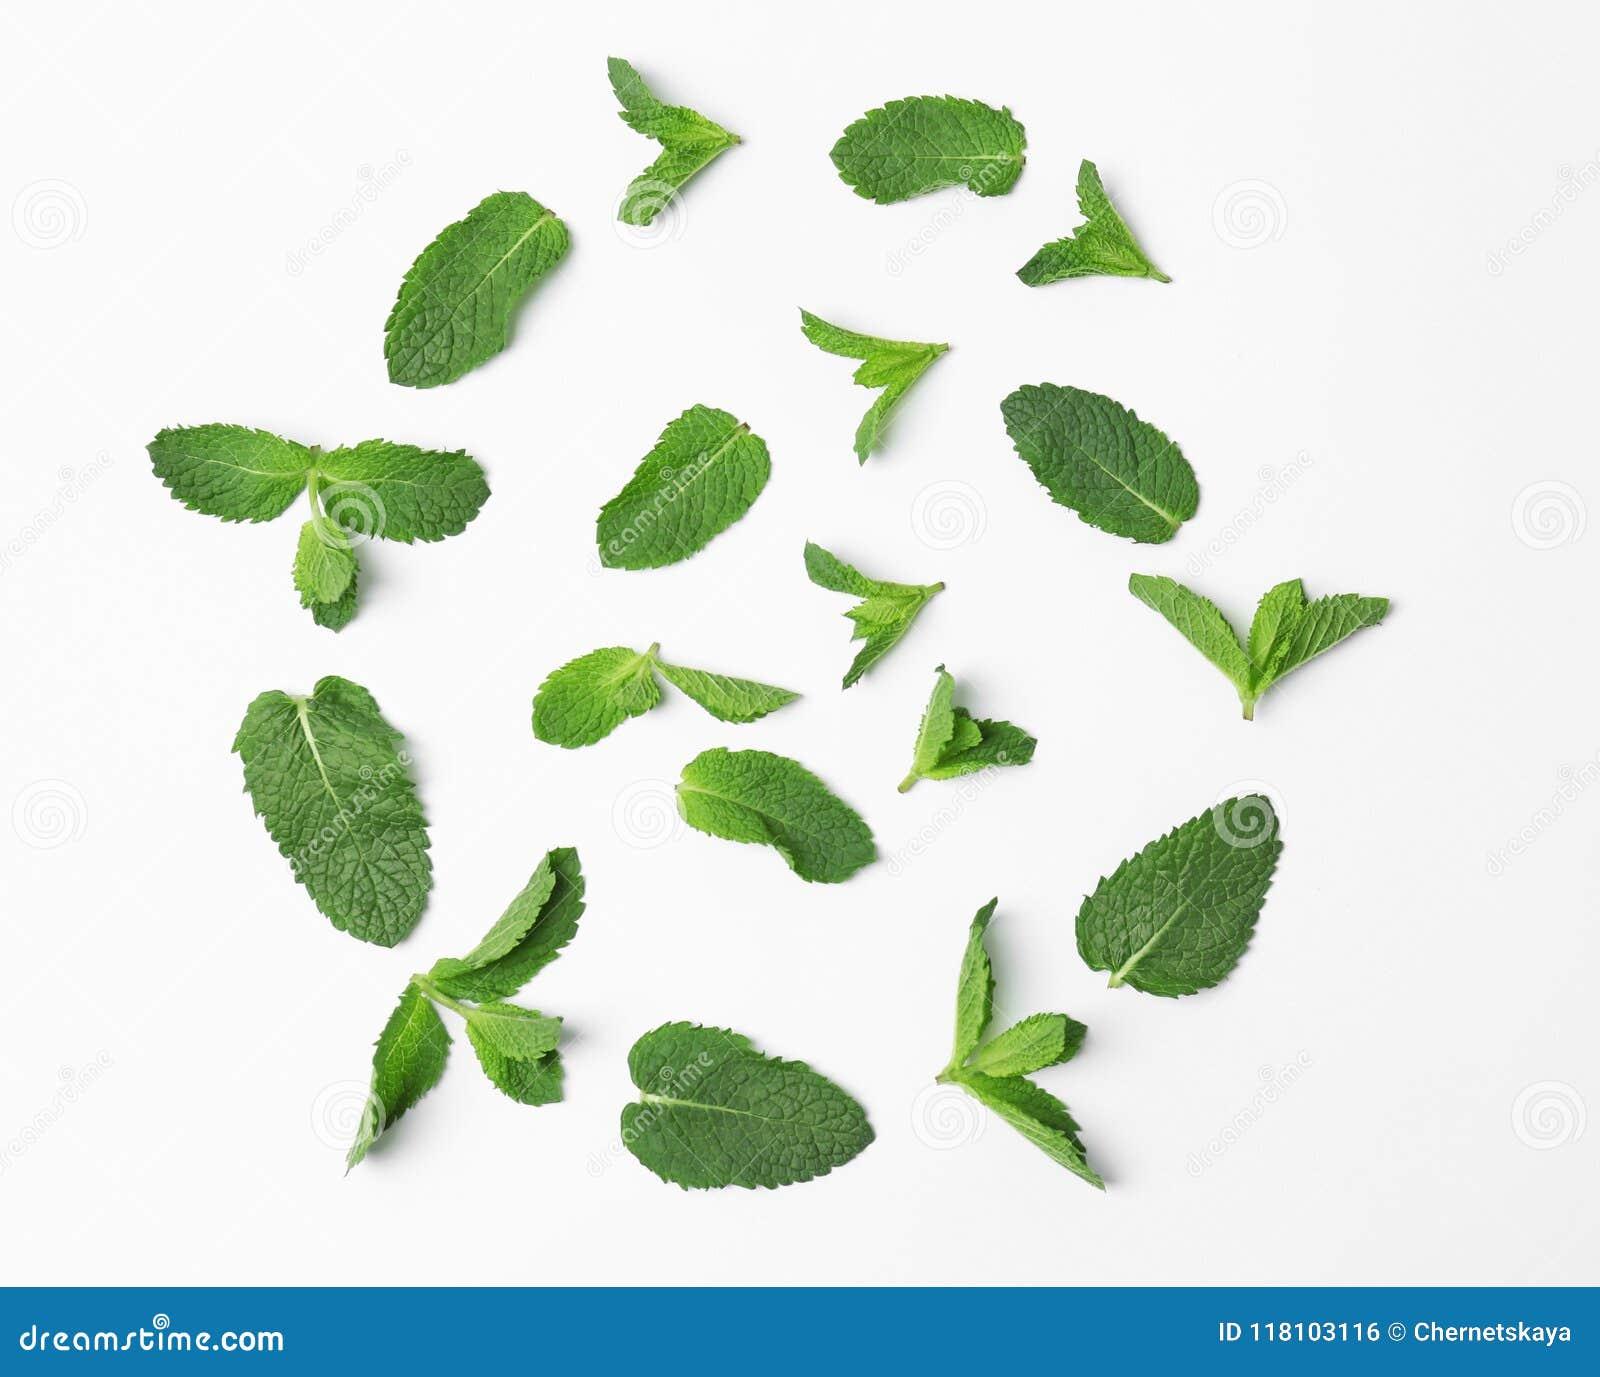 Samenstelling met verse groene muntbladeren op witte achtergrond, hoogste mening